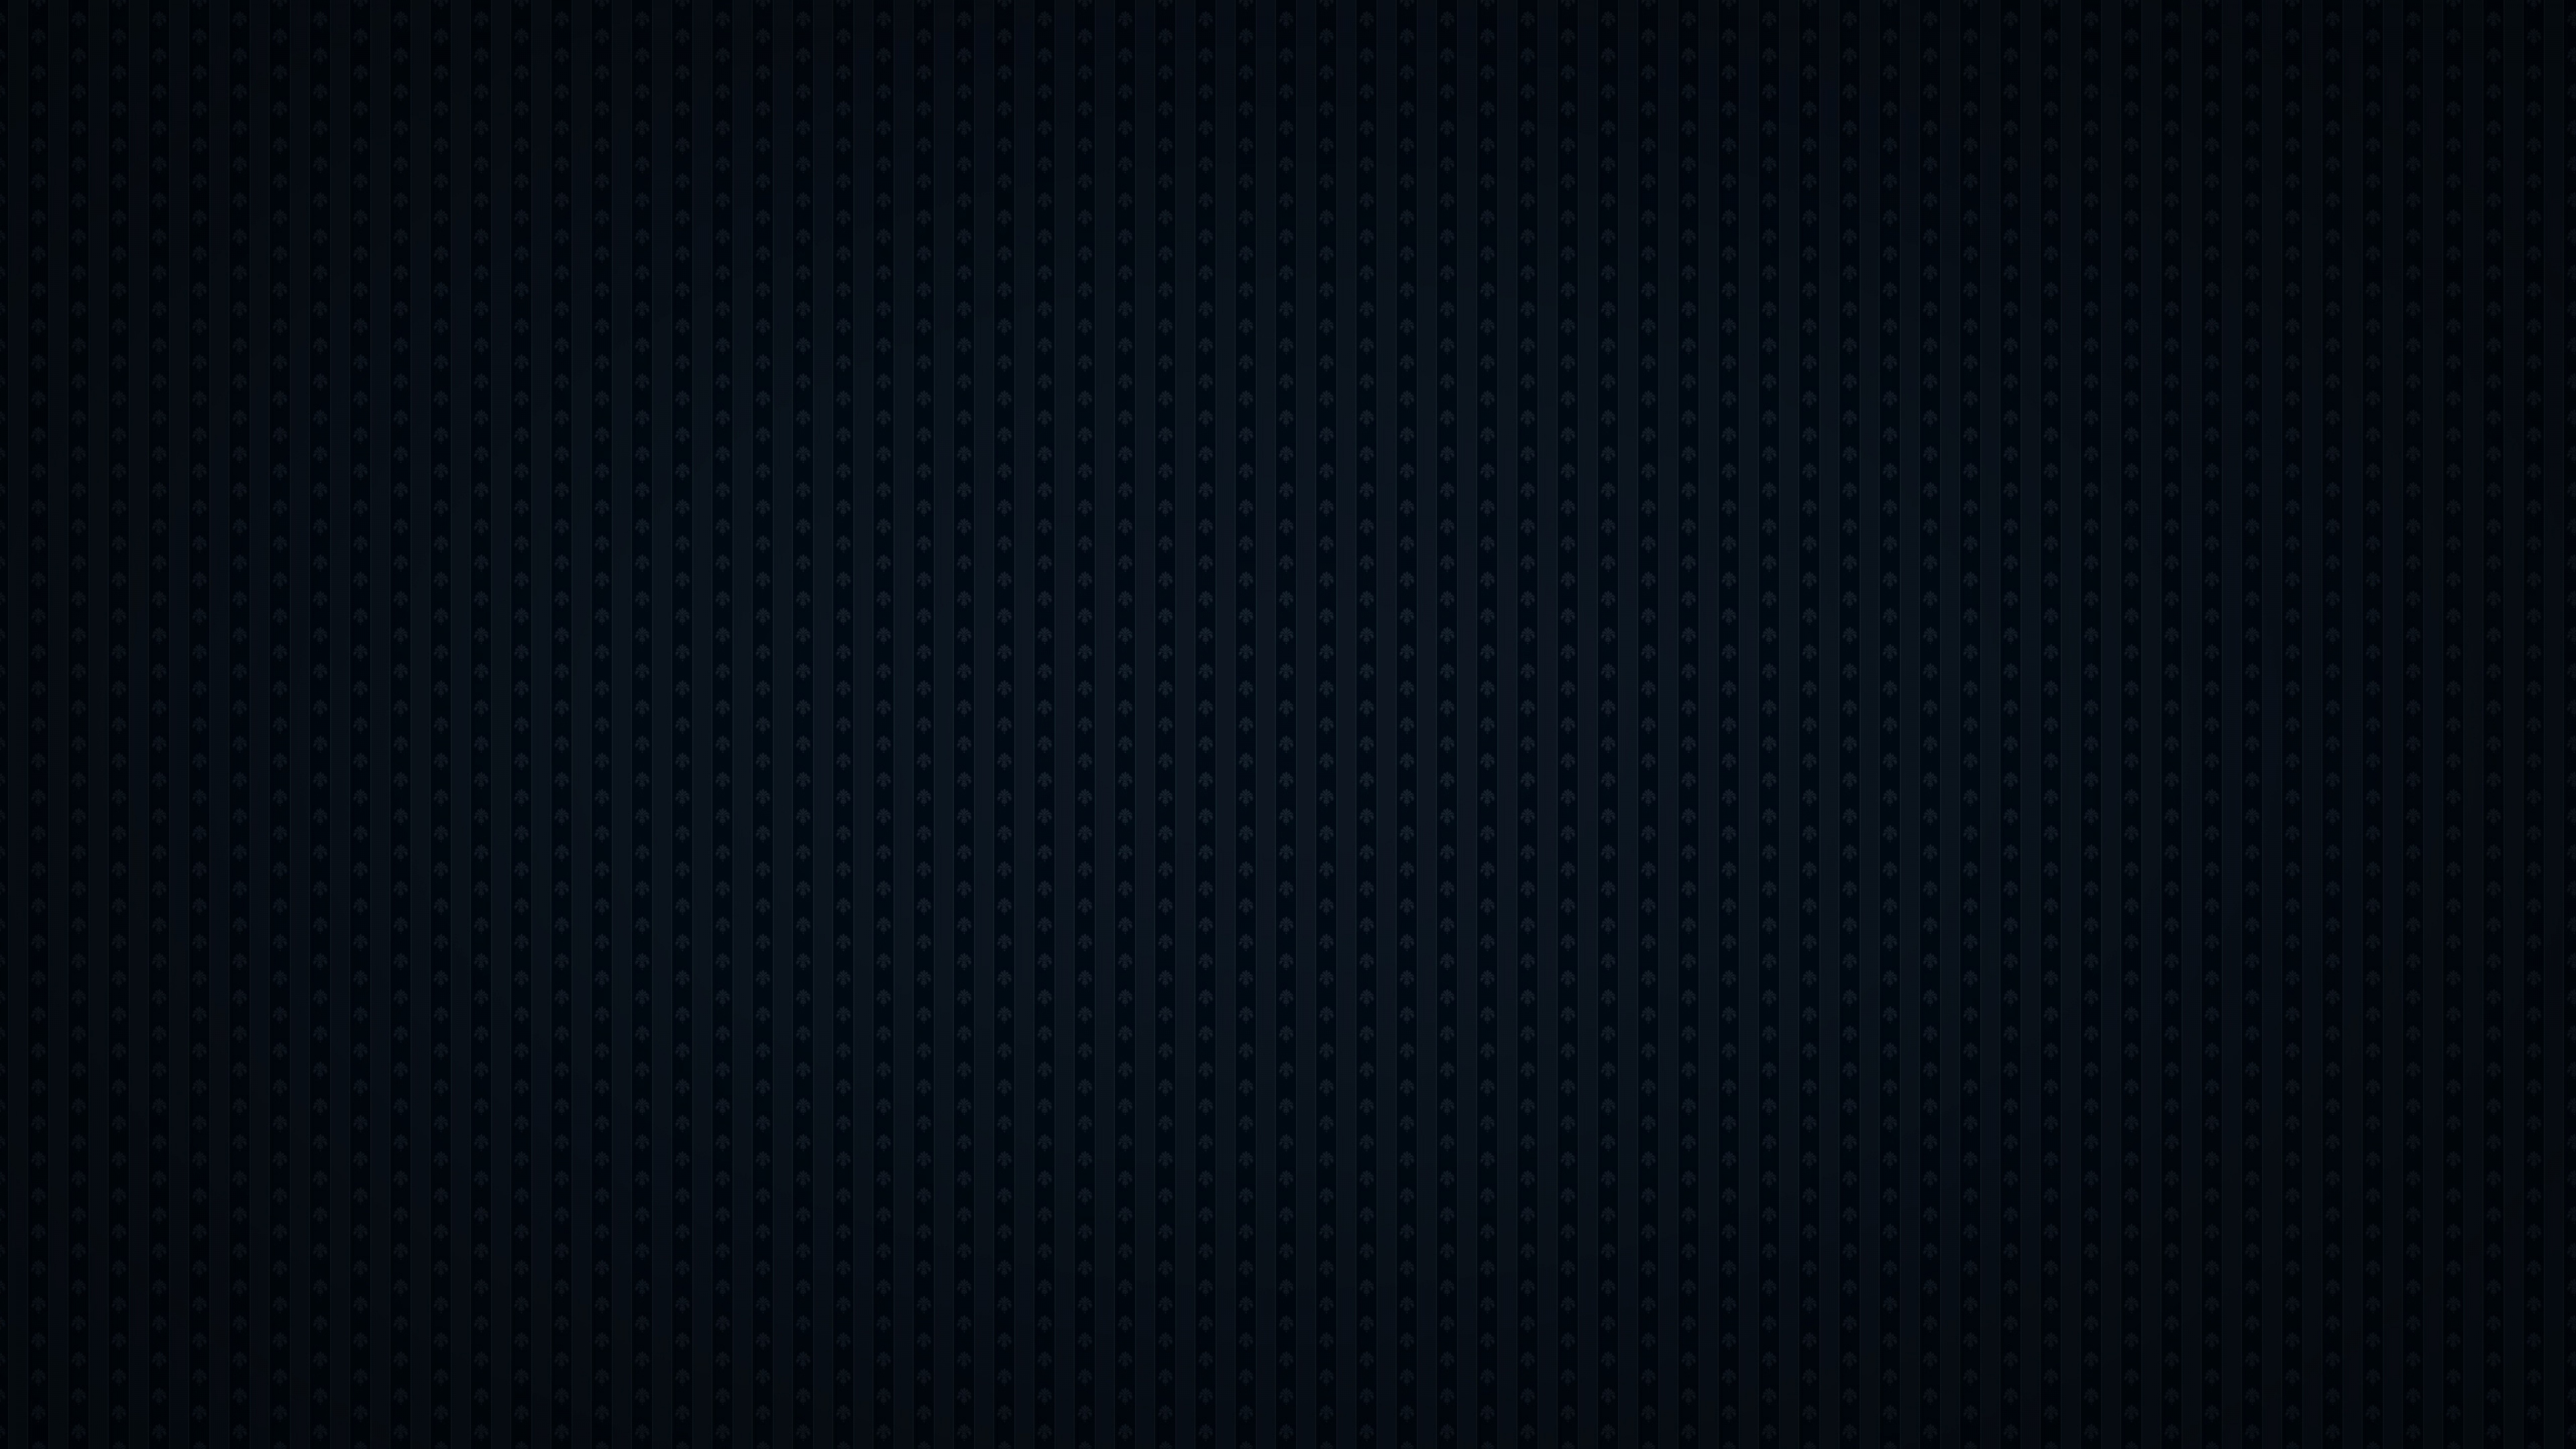 Stripes Vertical Pattern Texture Wallpaper Background 4K Ultra HD 3840x2160